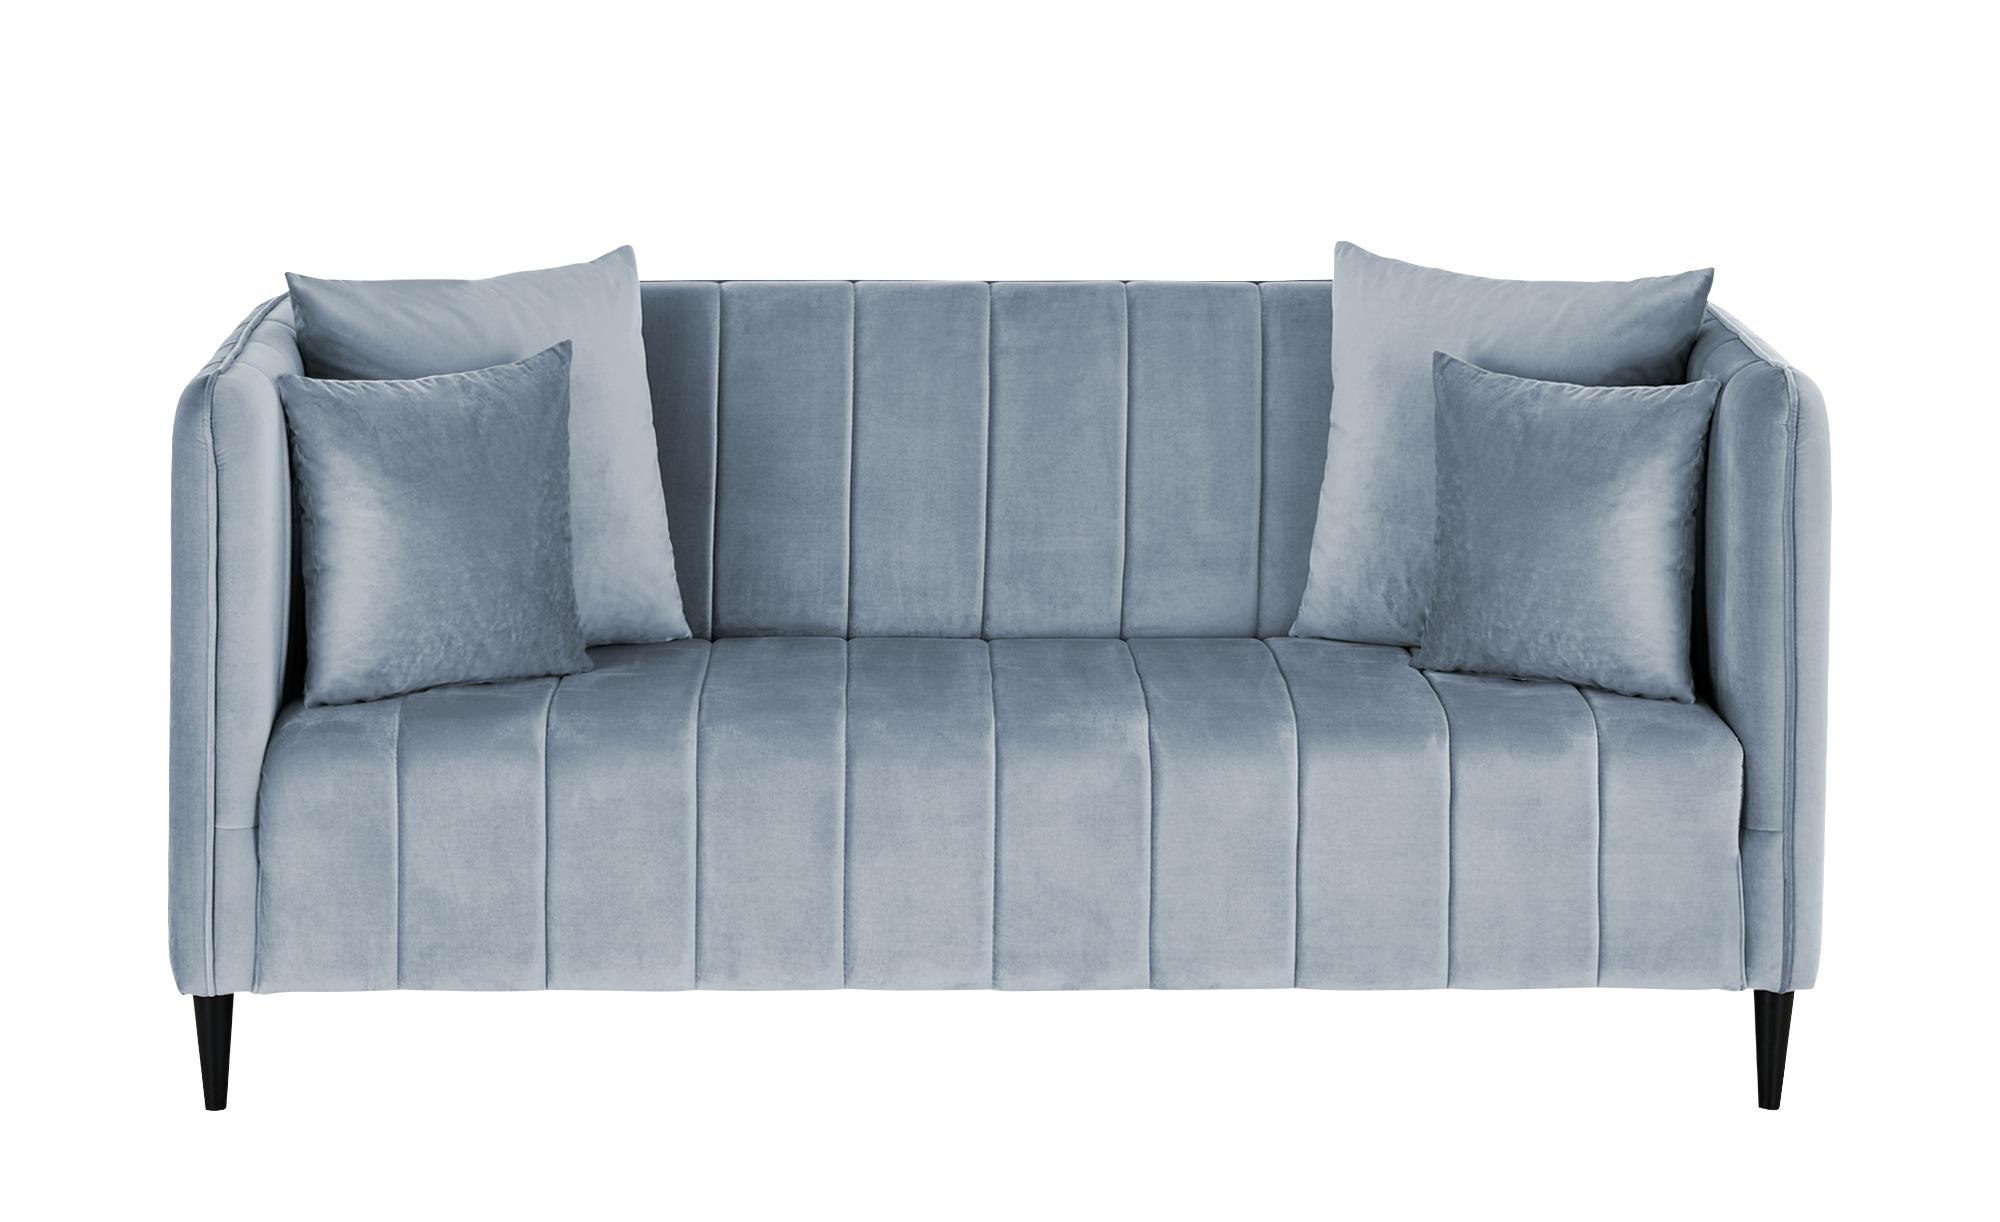 smart Sofa  Sara ¦ blau ¦ Maße (cm): B: 178 H: 82 T: 90 Polstermöbel > Sofas > 2-Sitzer - Höffner